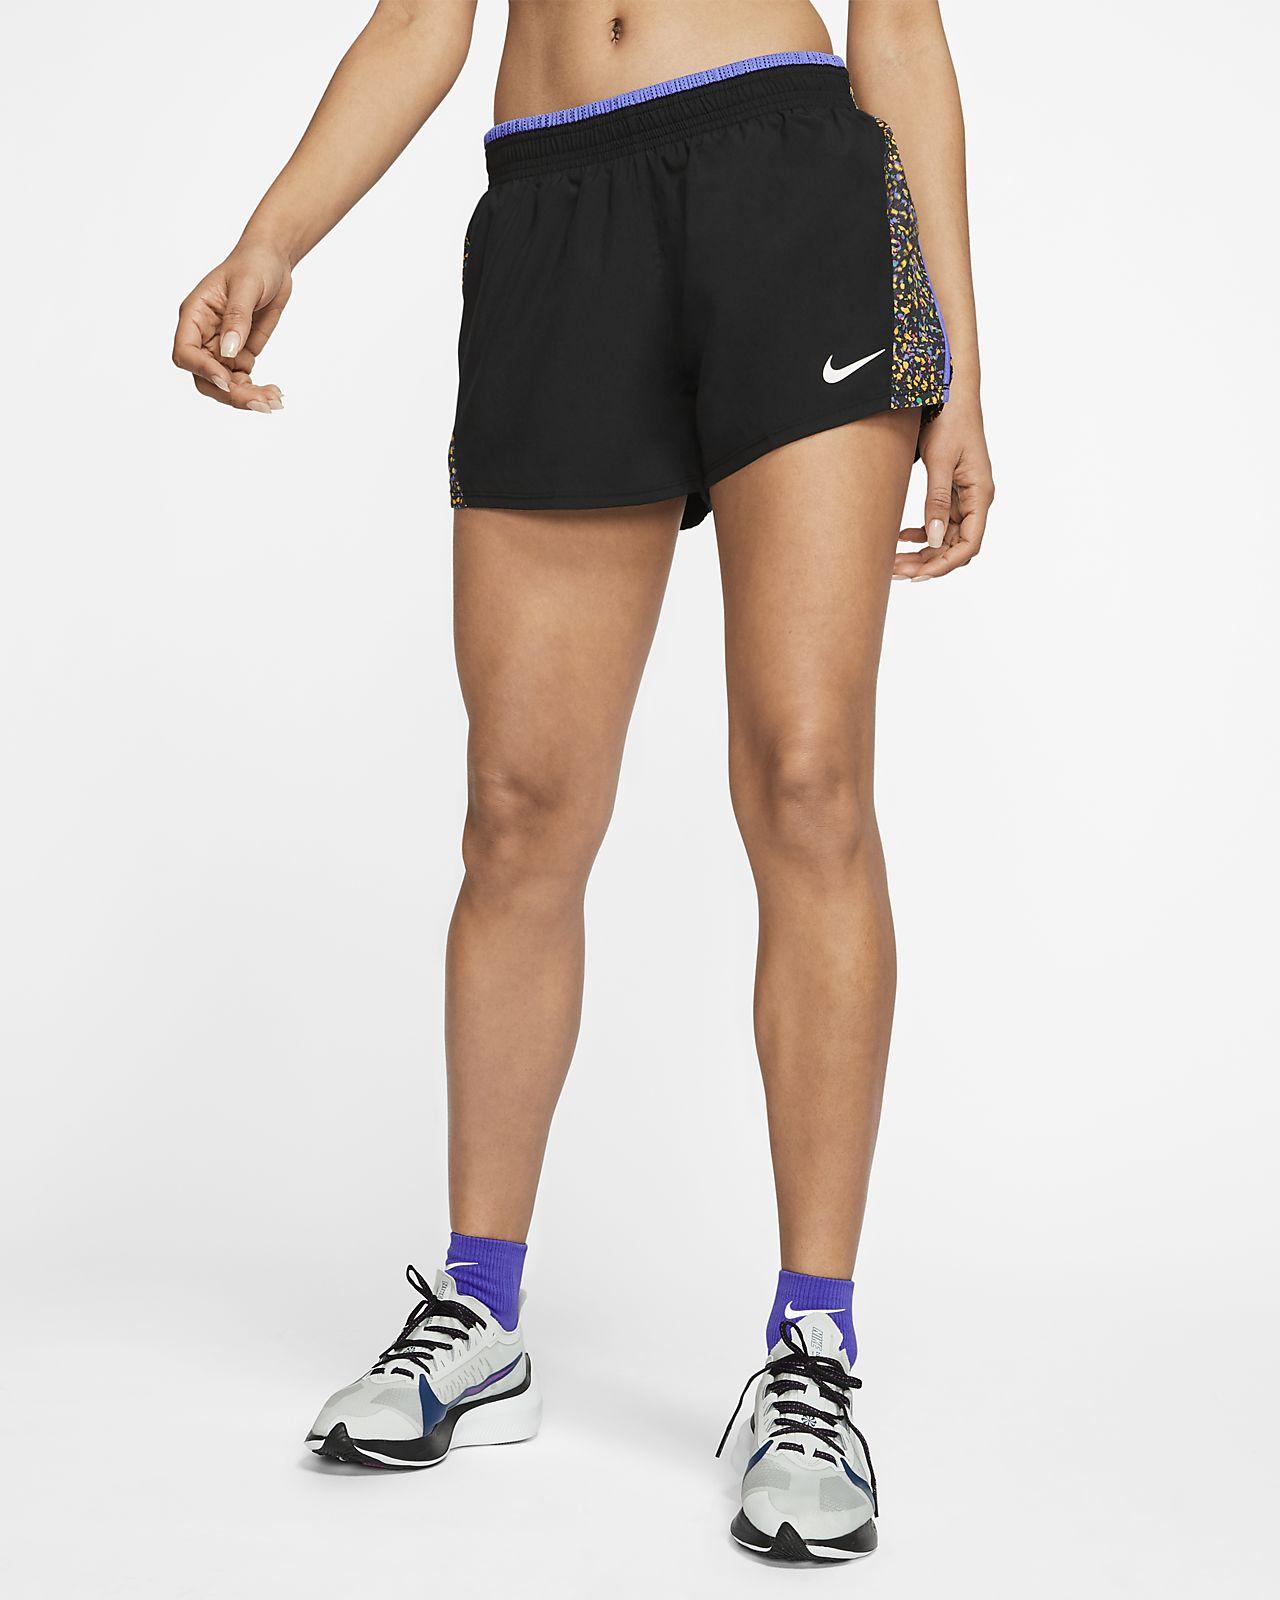 Женские беговые шорты Nike 10K Icon Clash